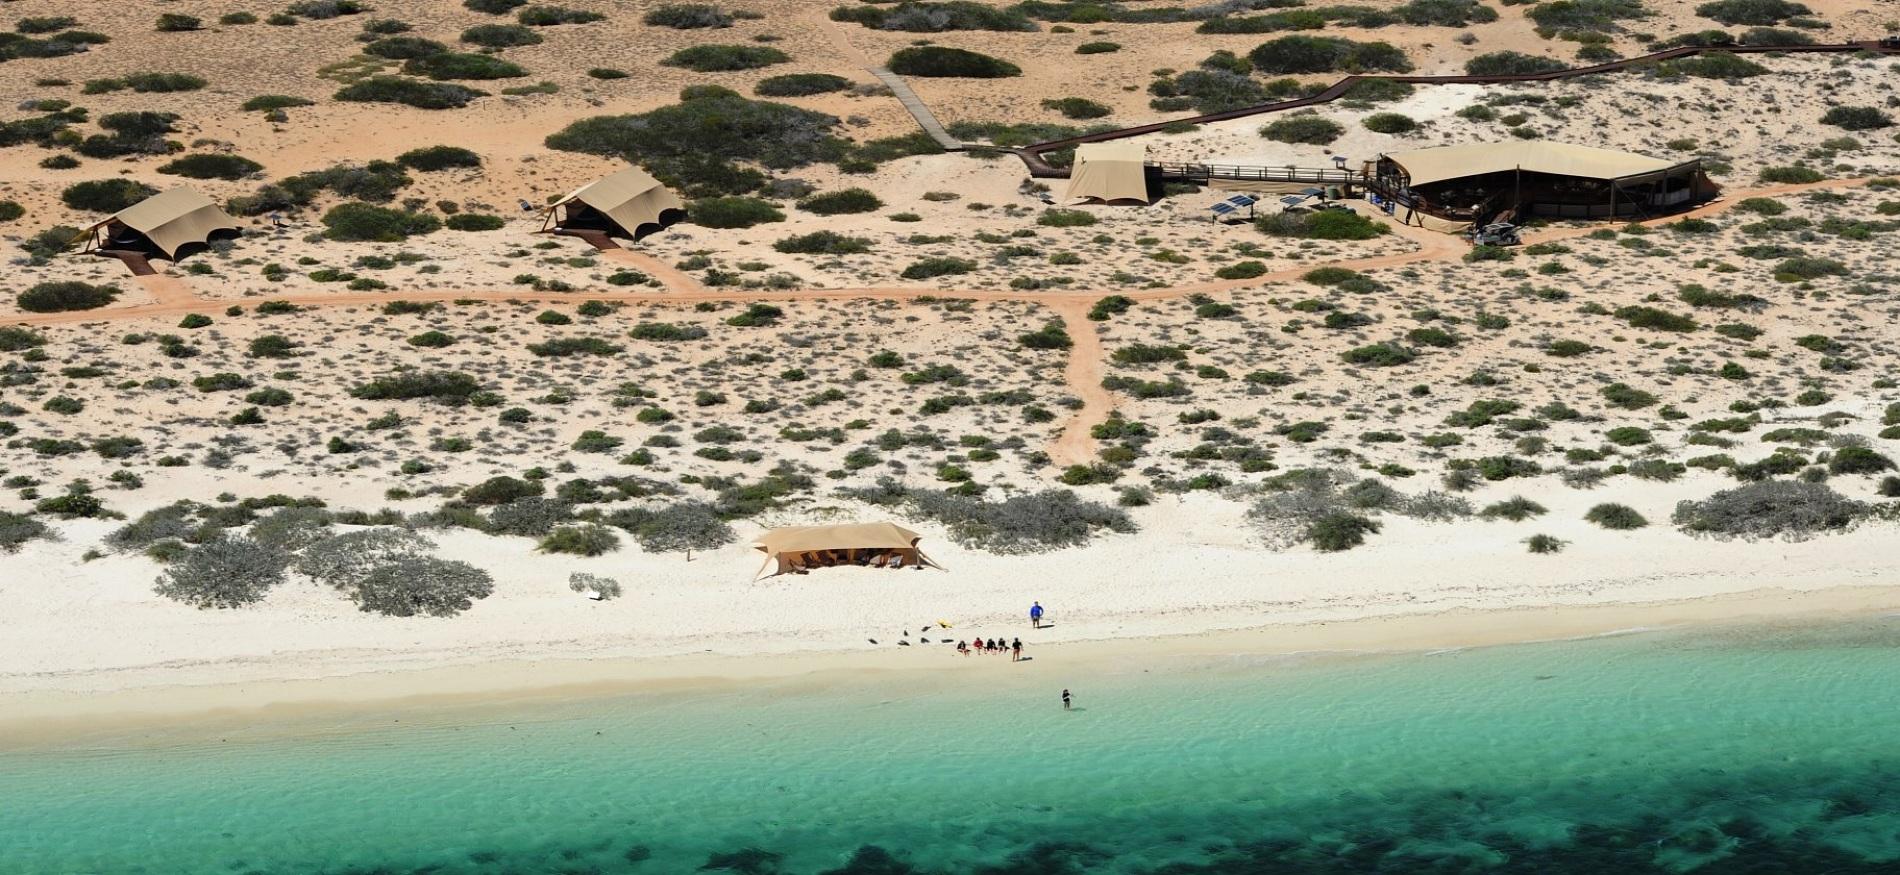 The luxury camp of Sal Salis